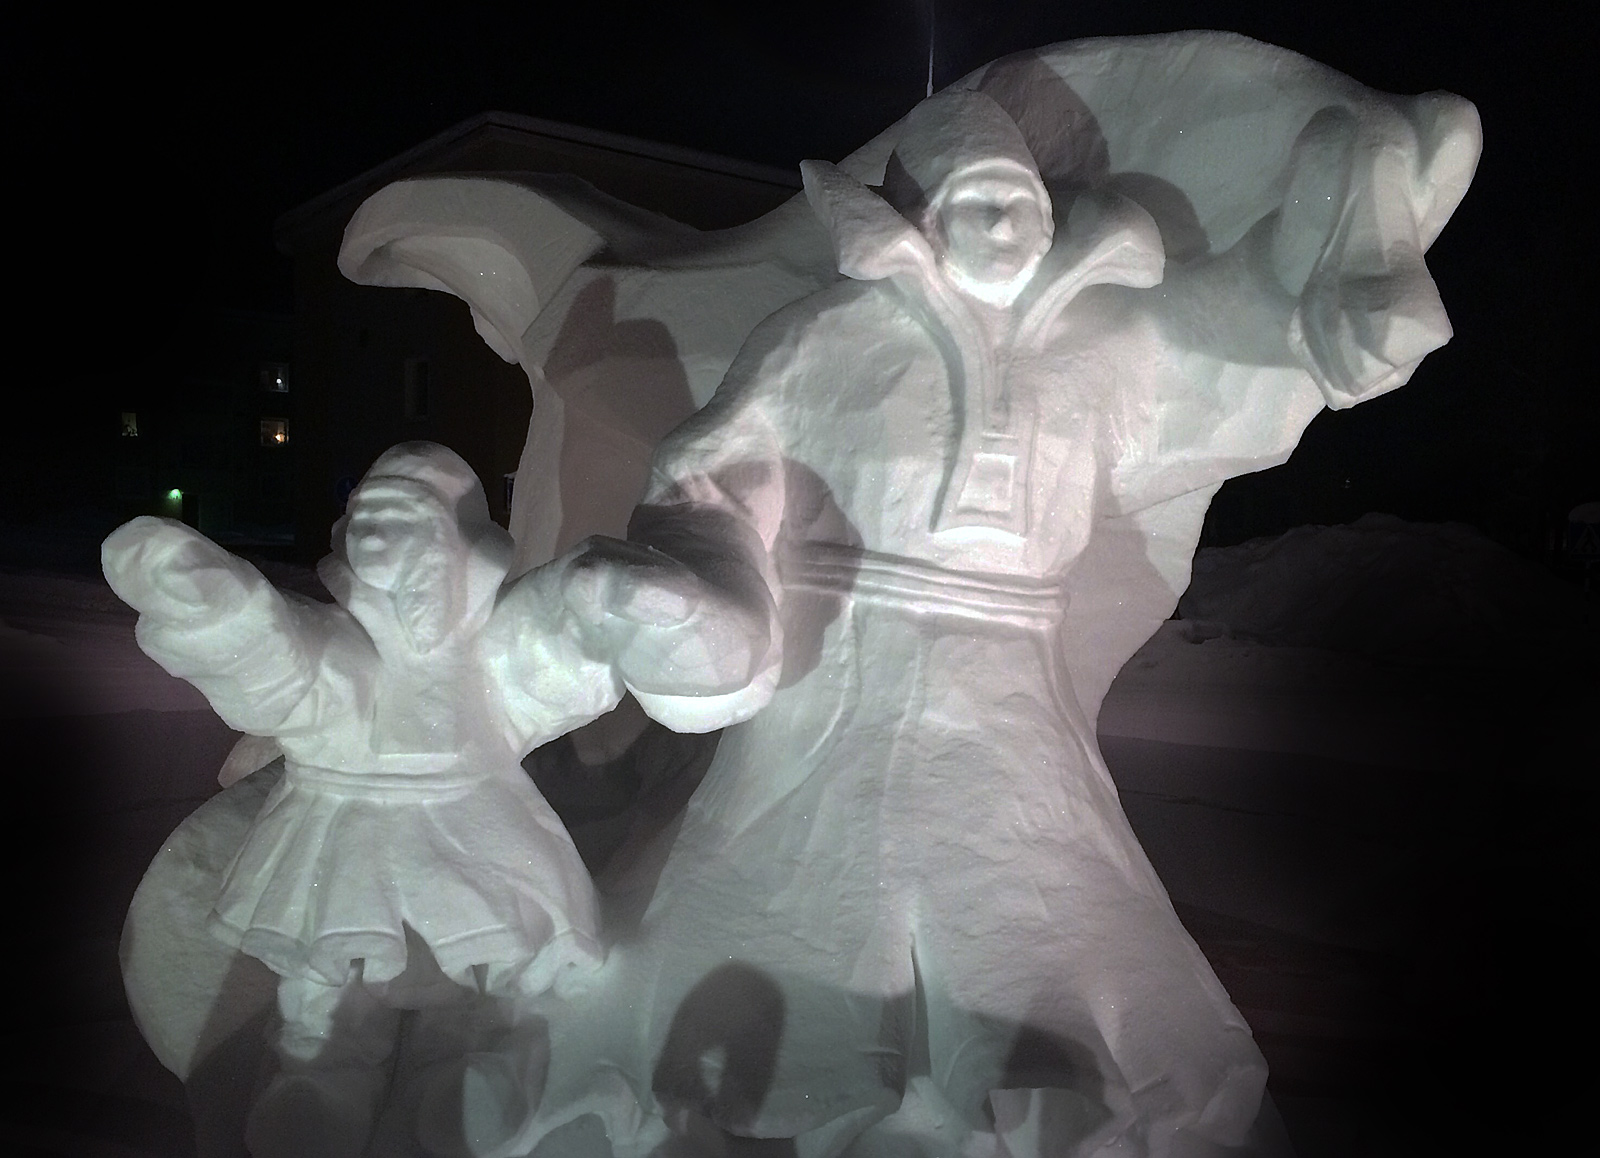 Jokkmokk Winter Market 2016 - The official winter market snow sculpture (at the Storgatan - Klockarvägen roundabout)